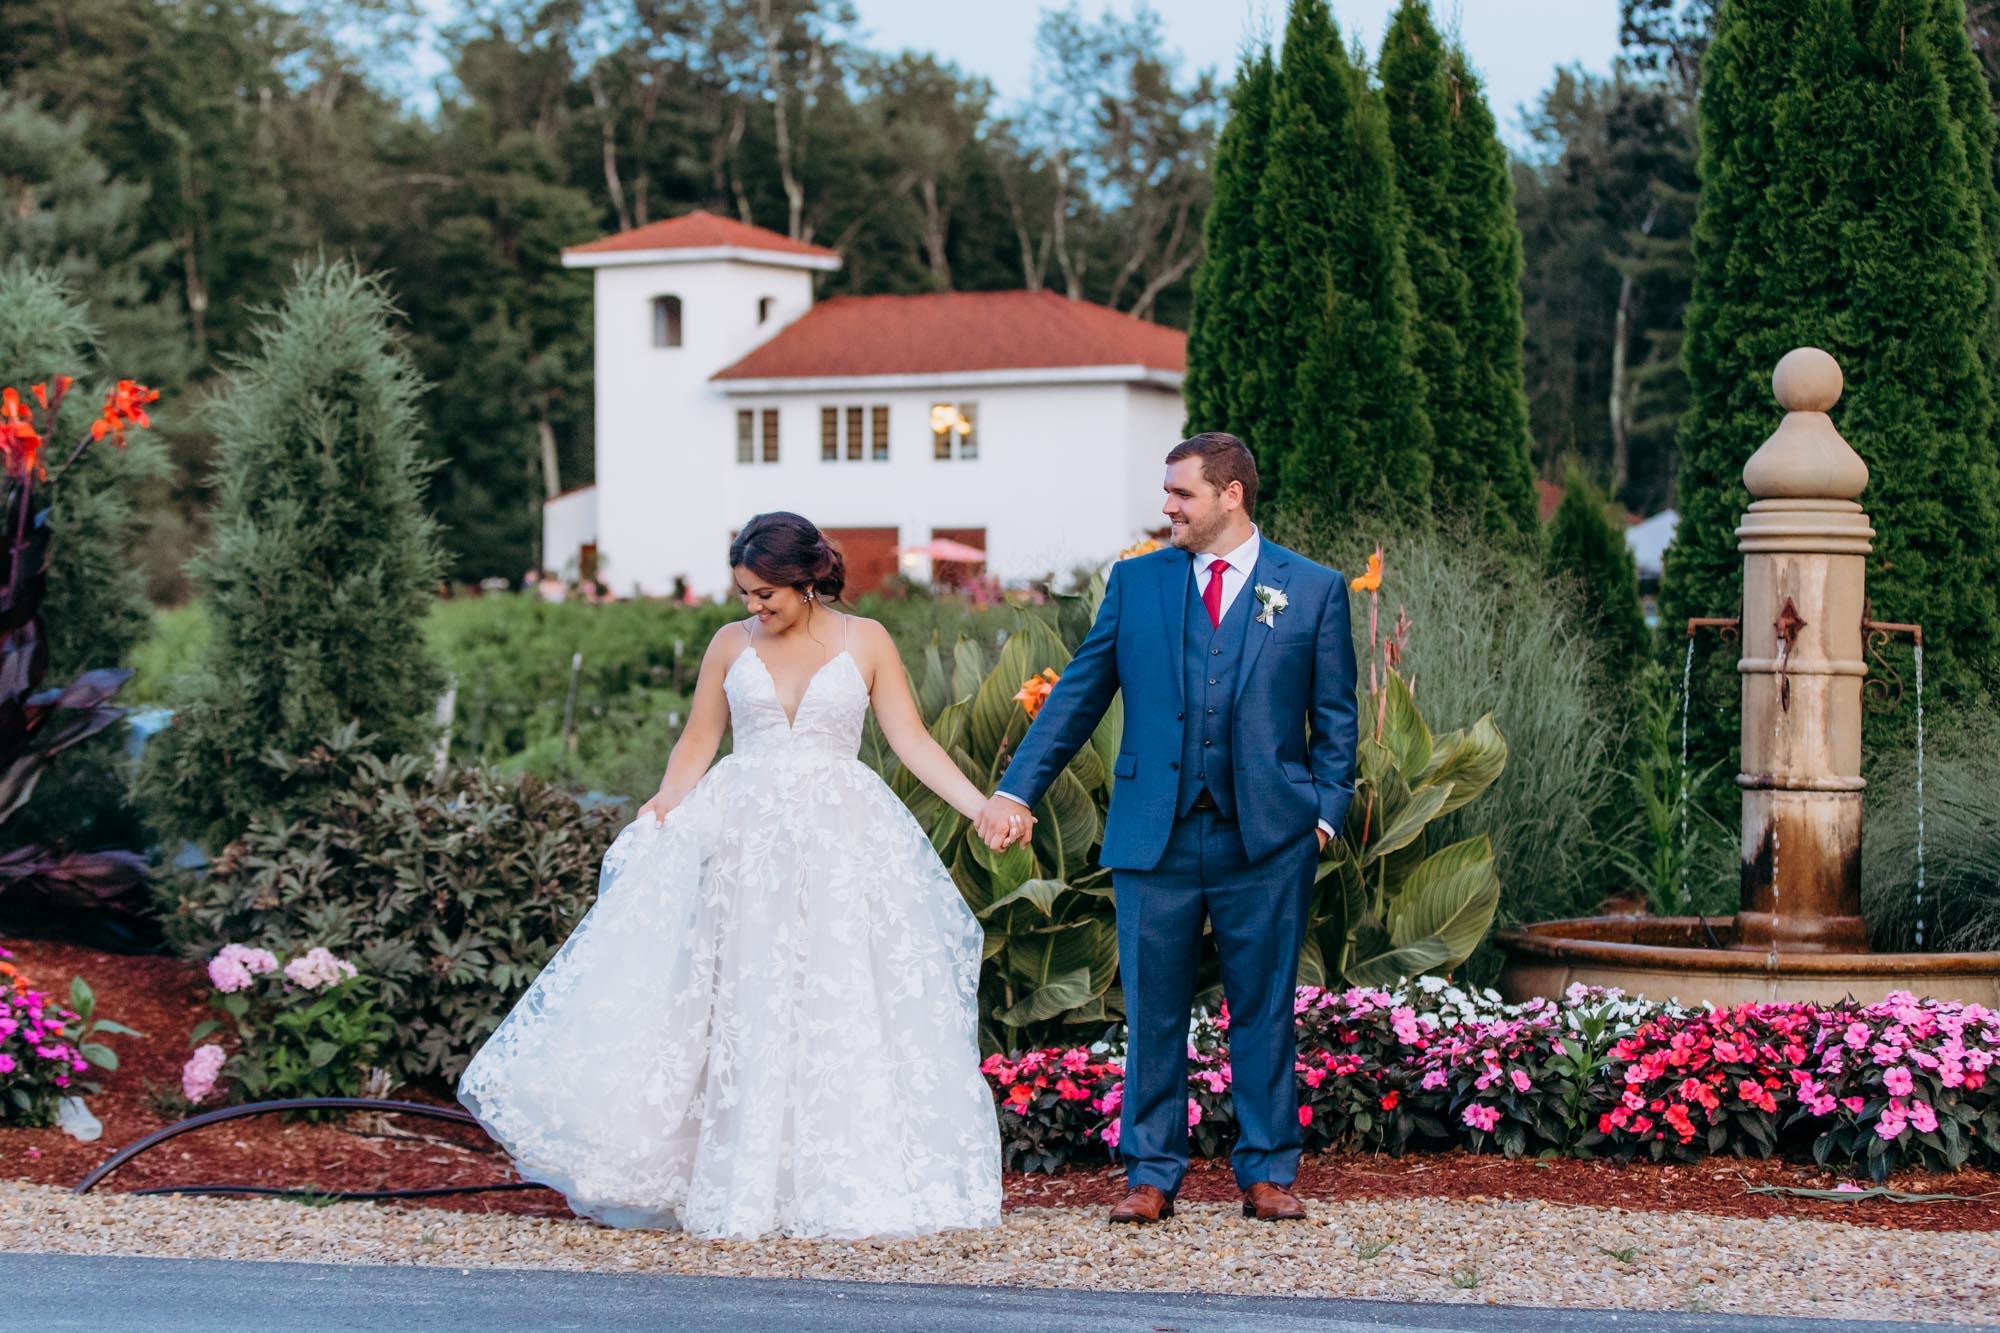 Ashleigh Laureen Photography, NH wedding photographer, New Hampshire wedding photographer, New England wedding photographer, wedding photographer NH, Fulchino Vineyard